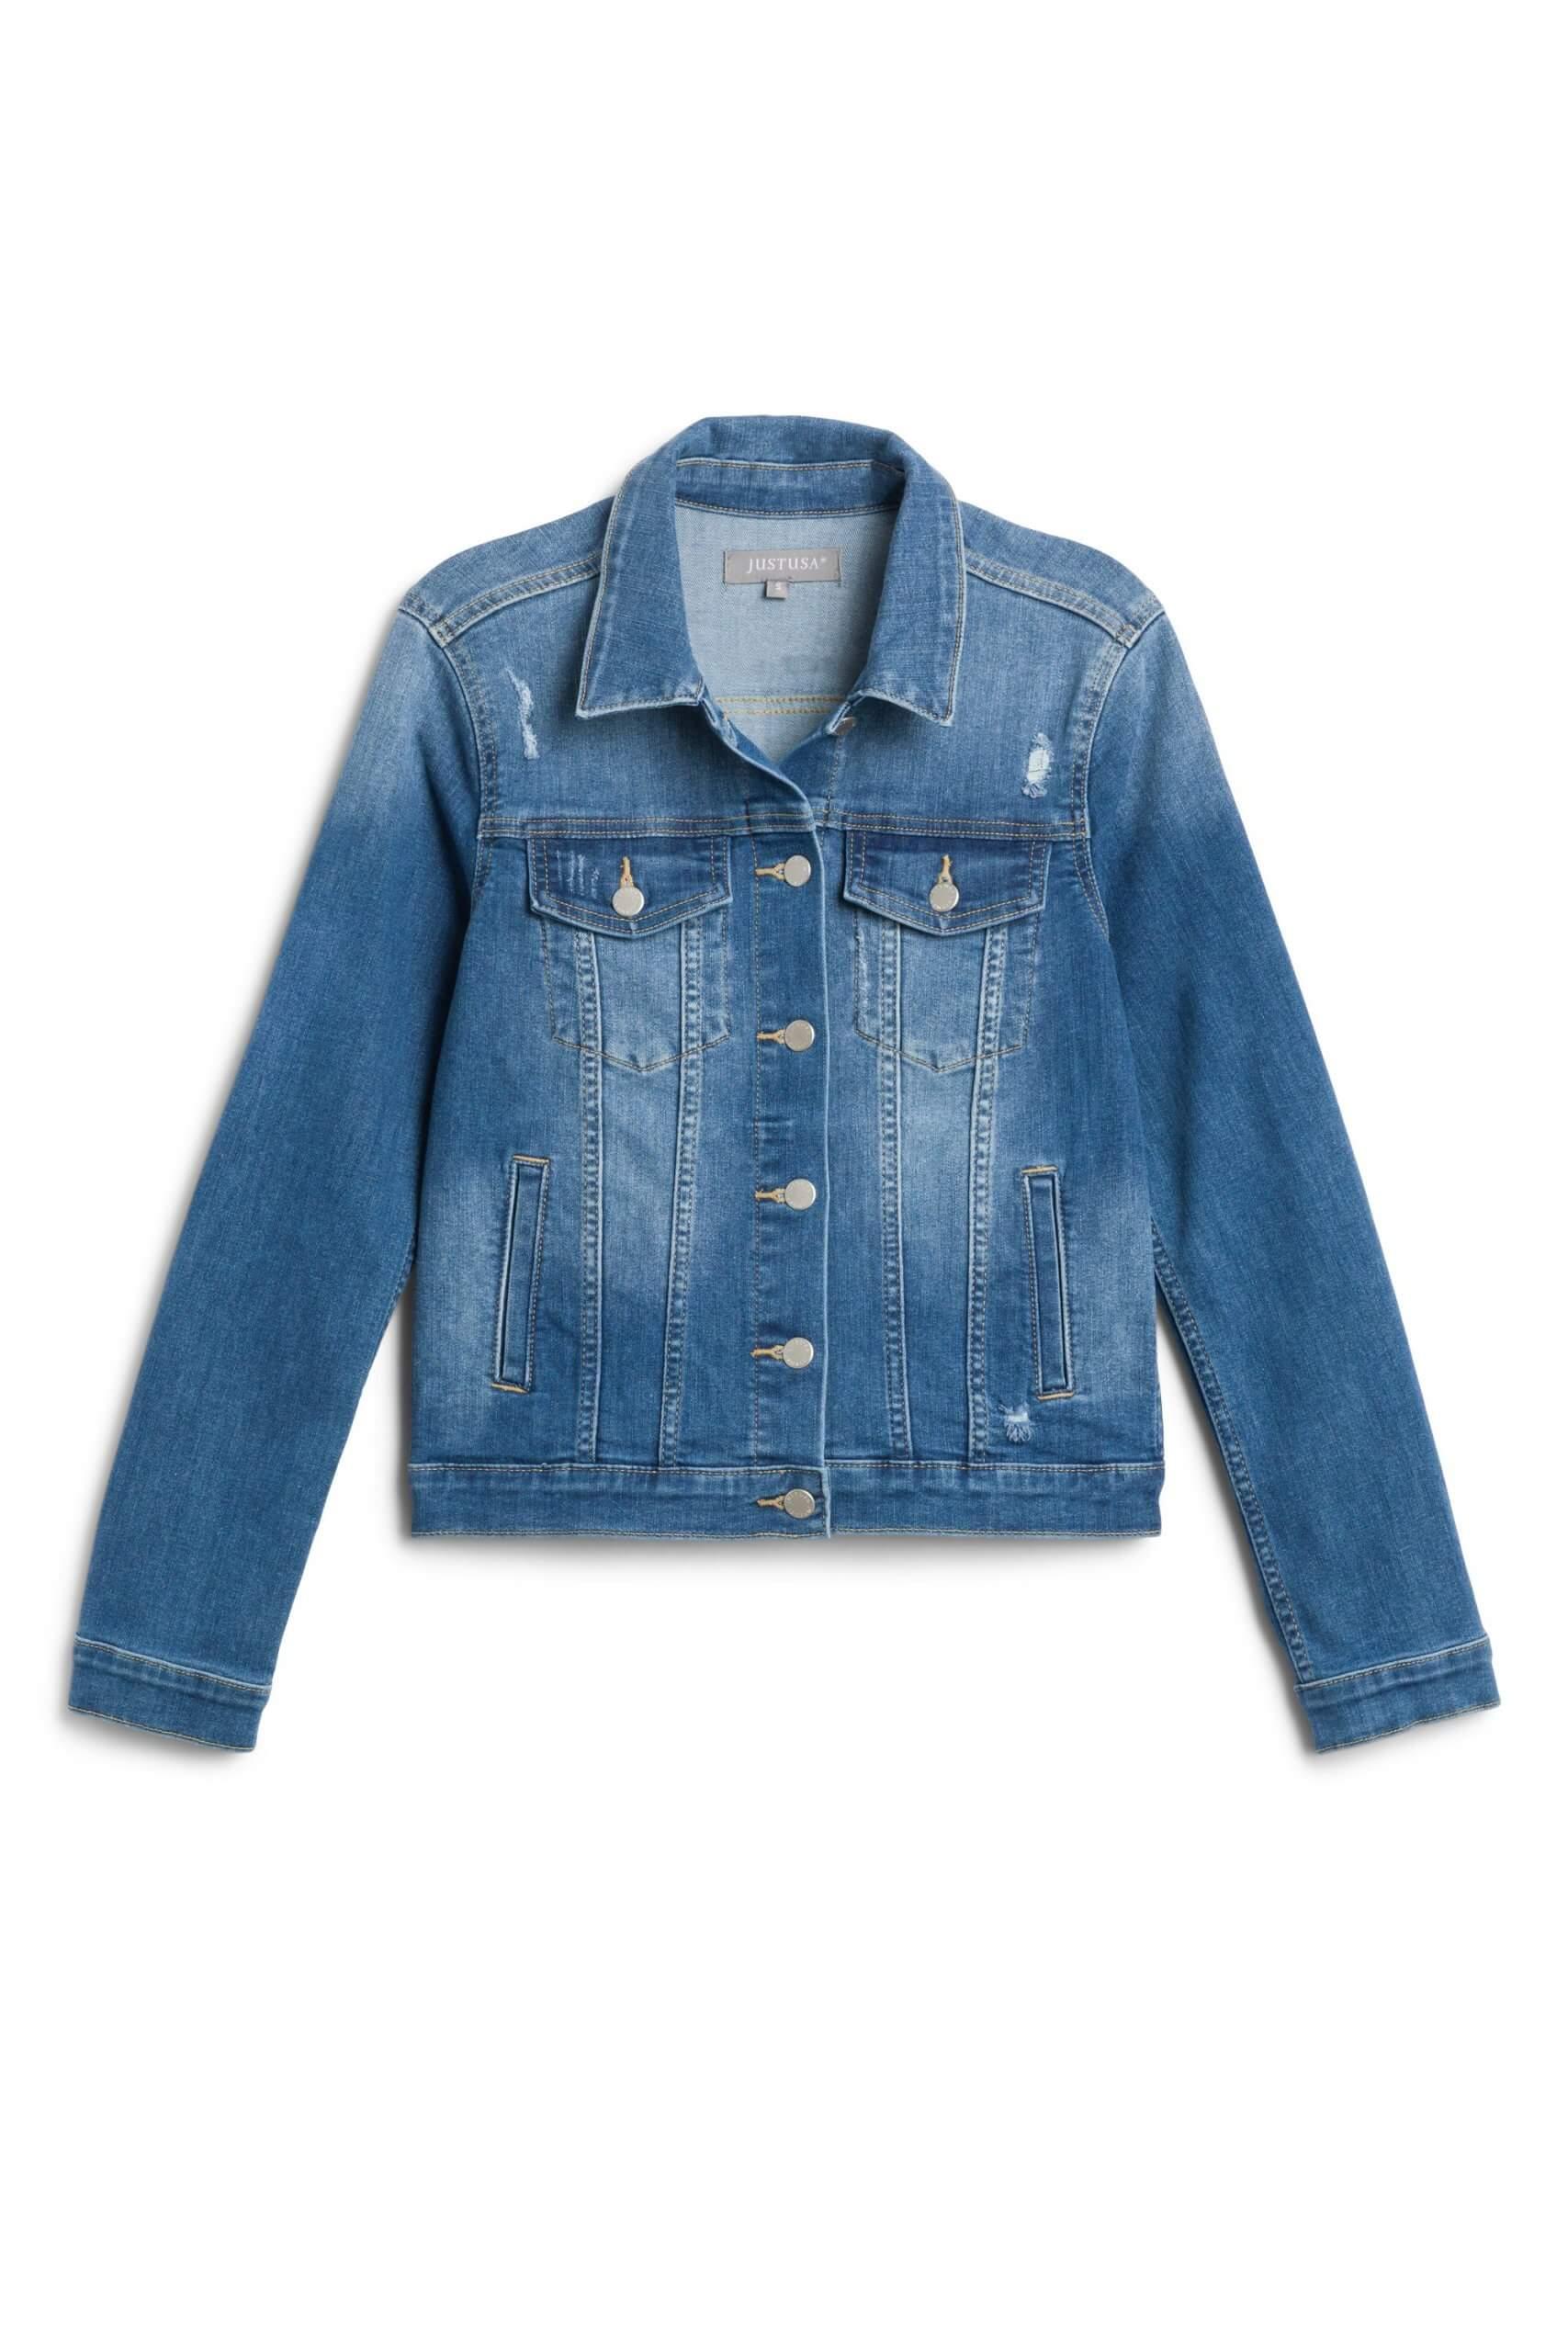 Stitch Fix women's blue denim jacket.